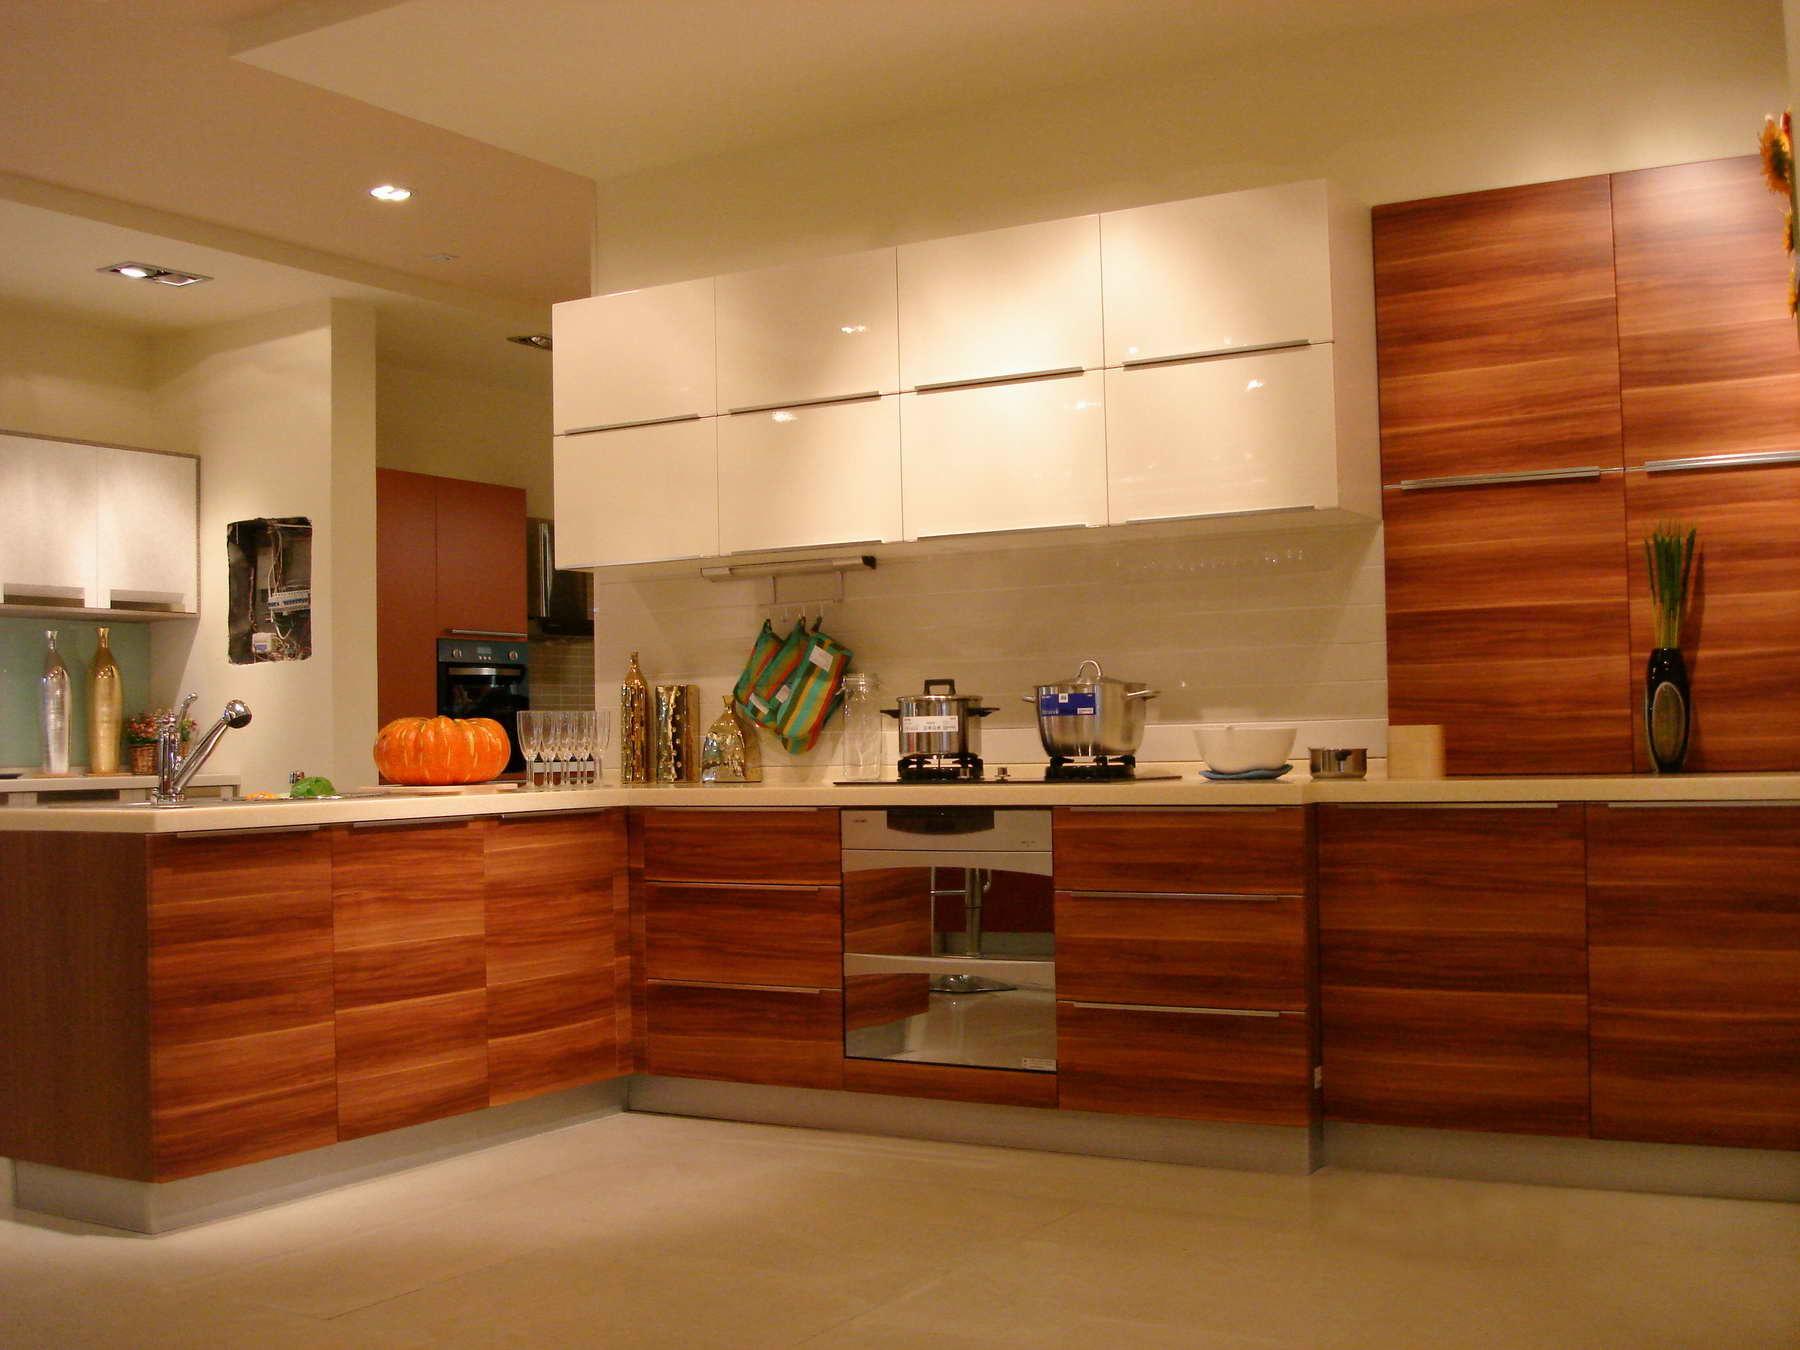 China Pvc Wrap Cabinets Crossover China Kitchen